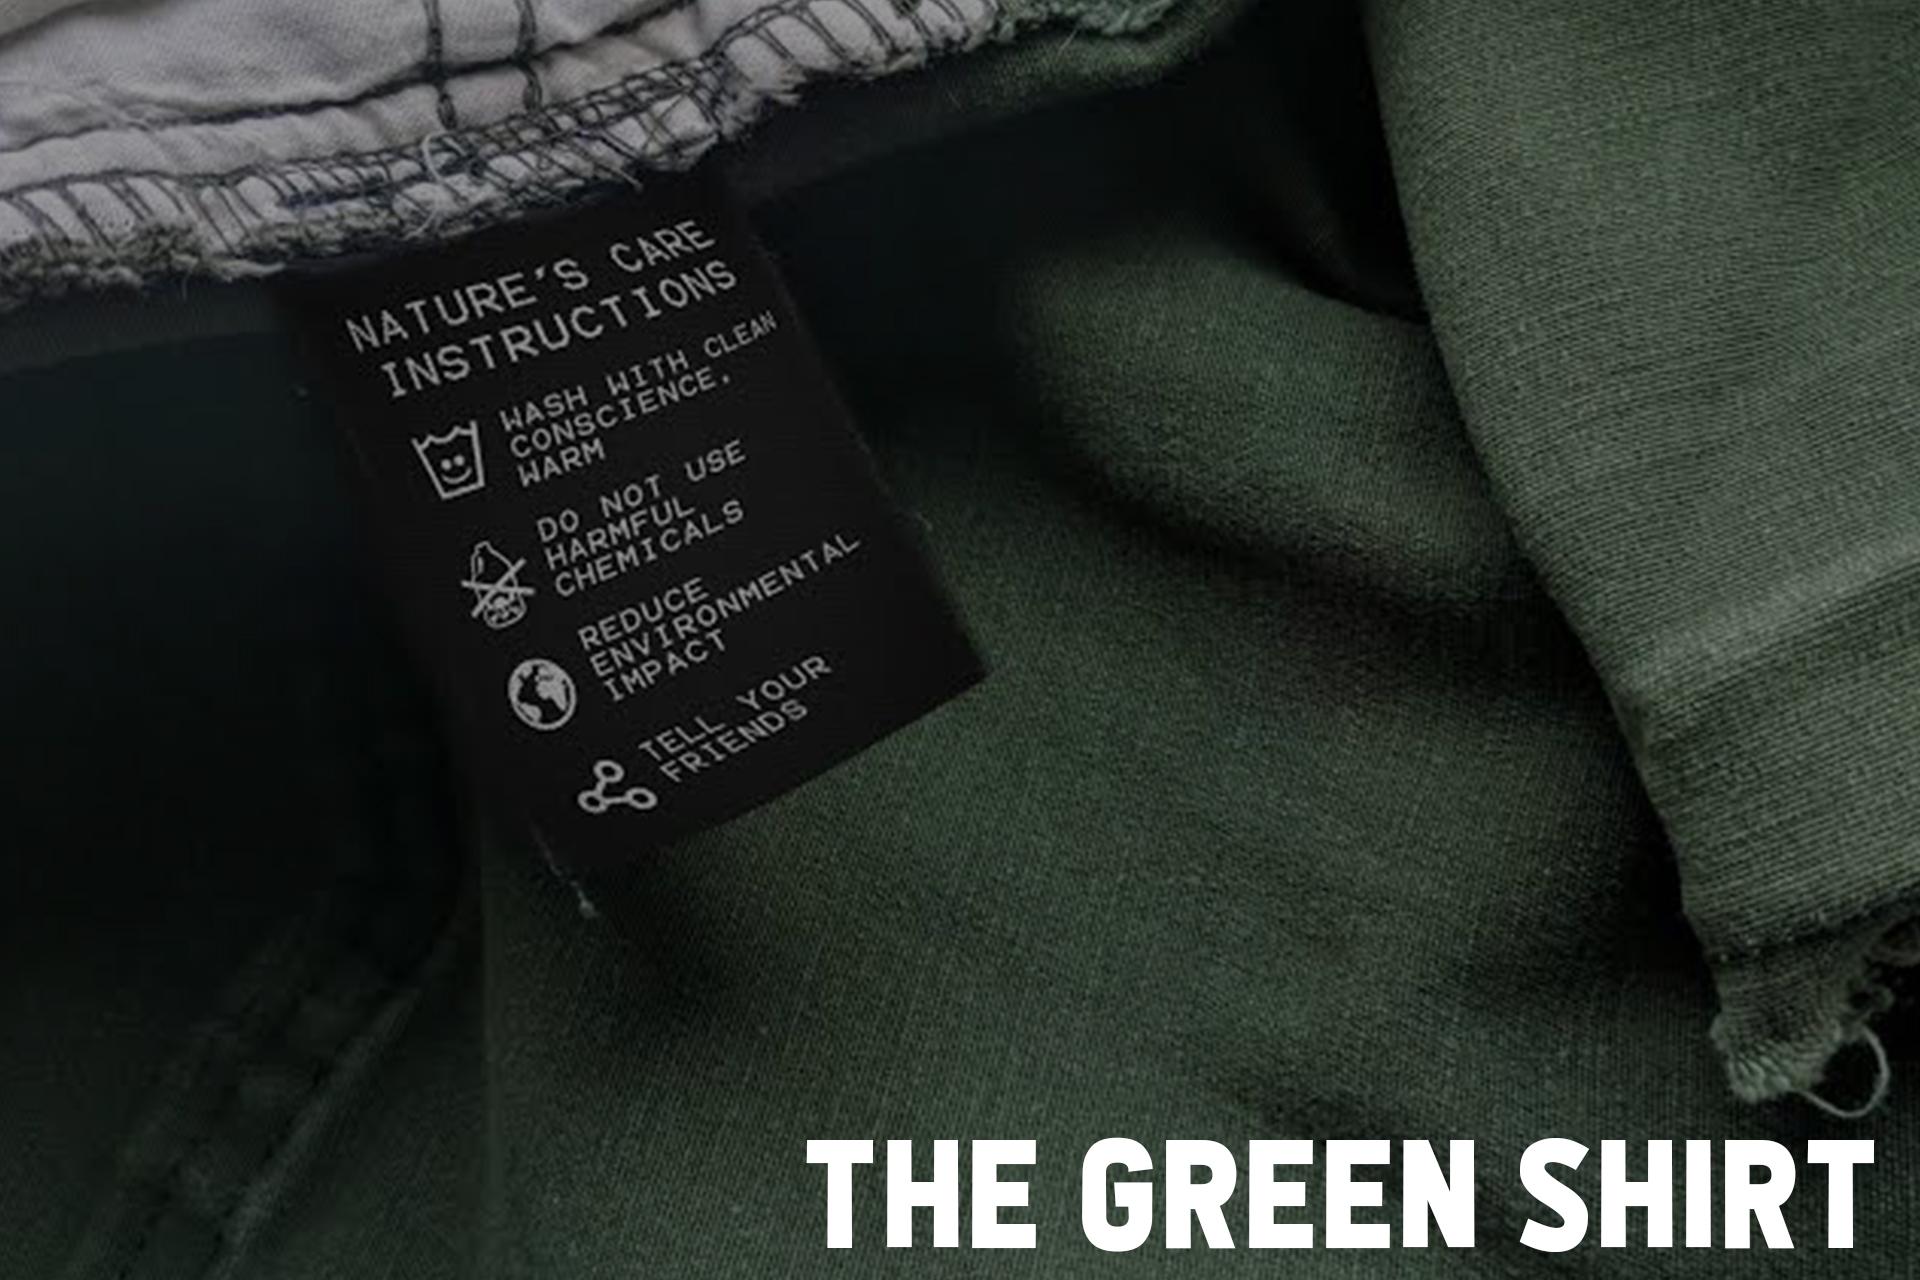 thegreenshirt-INTRO.jpg